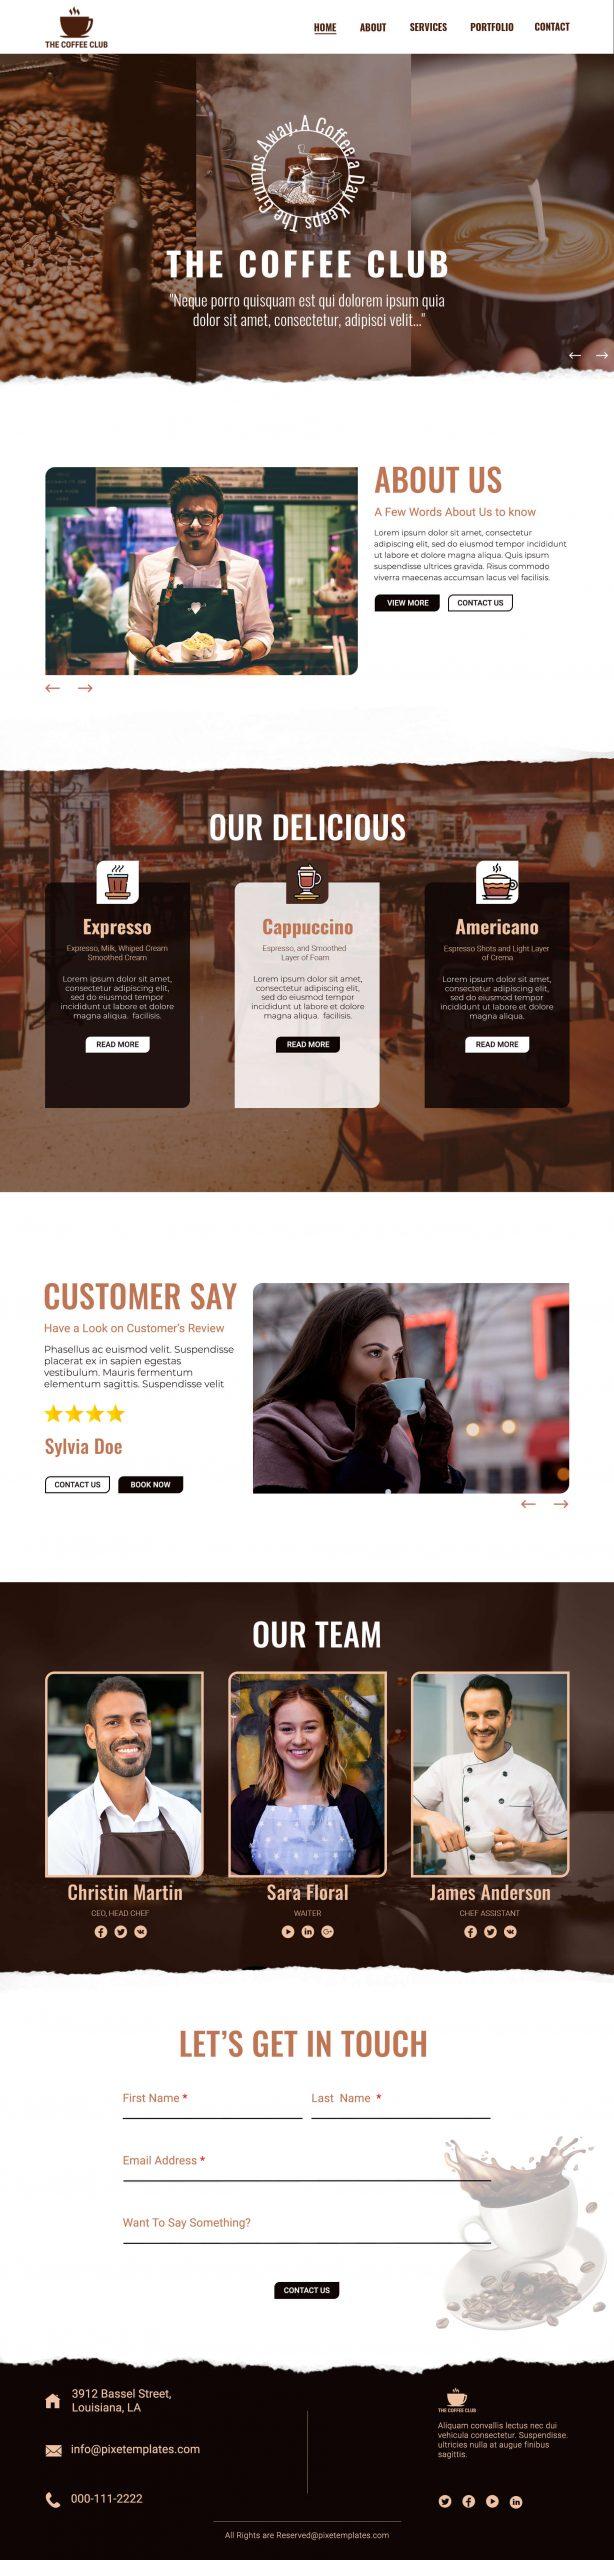 Restaurant Menu Website in Source PSD Free Download